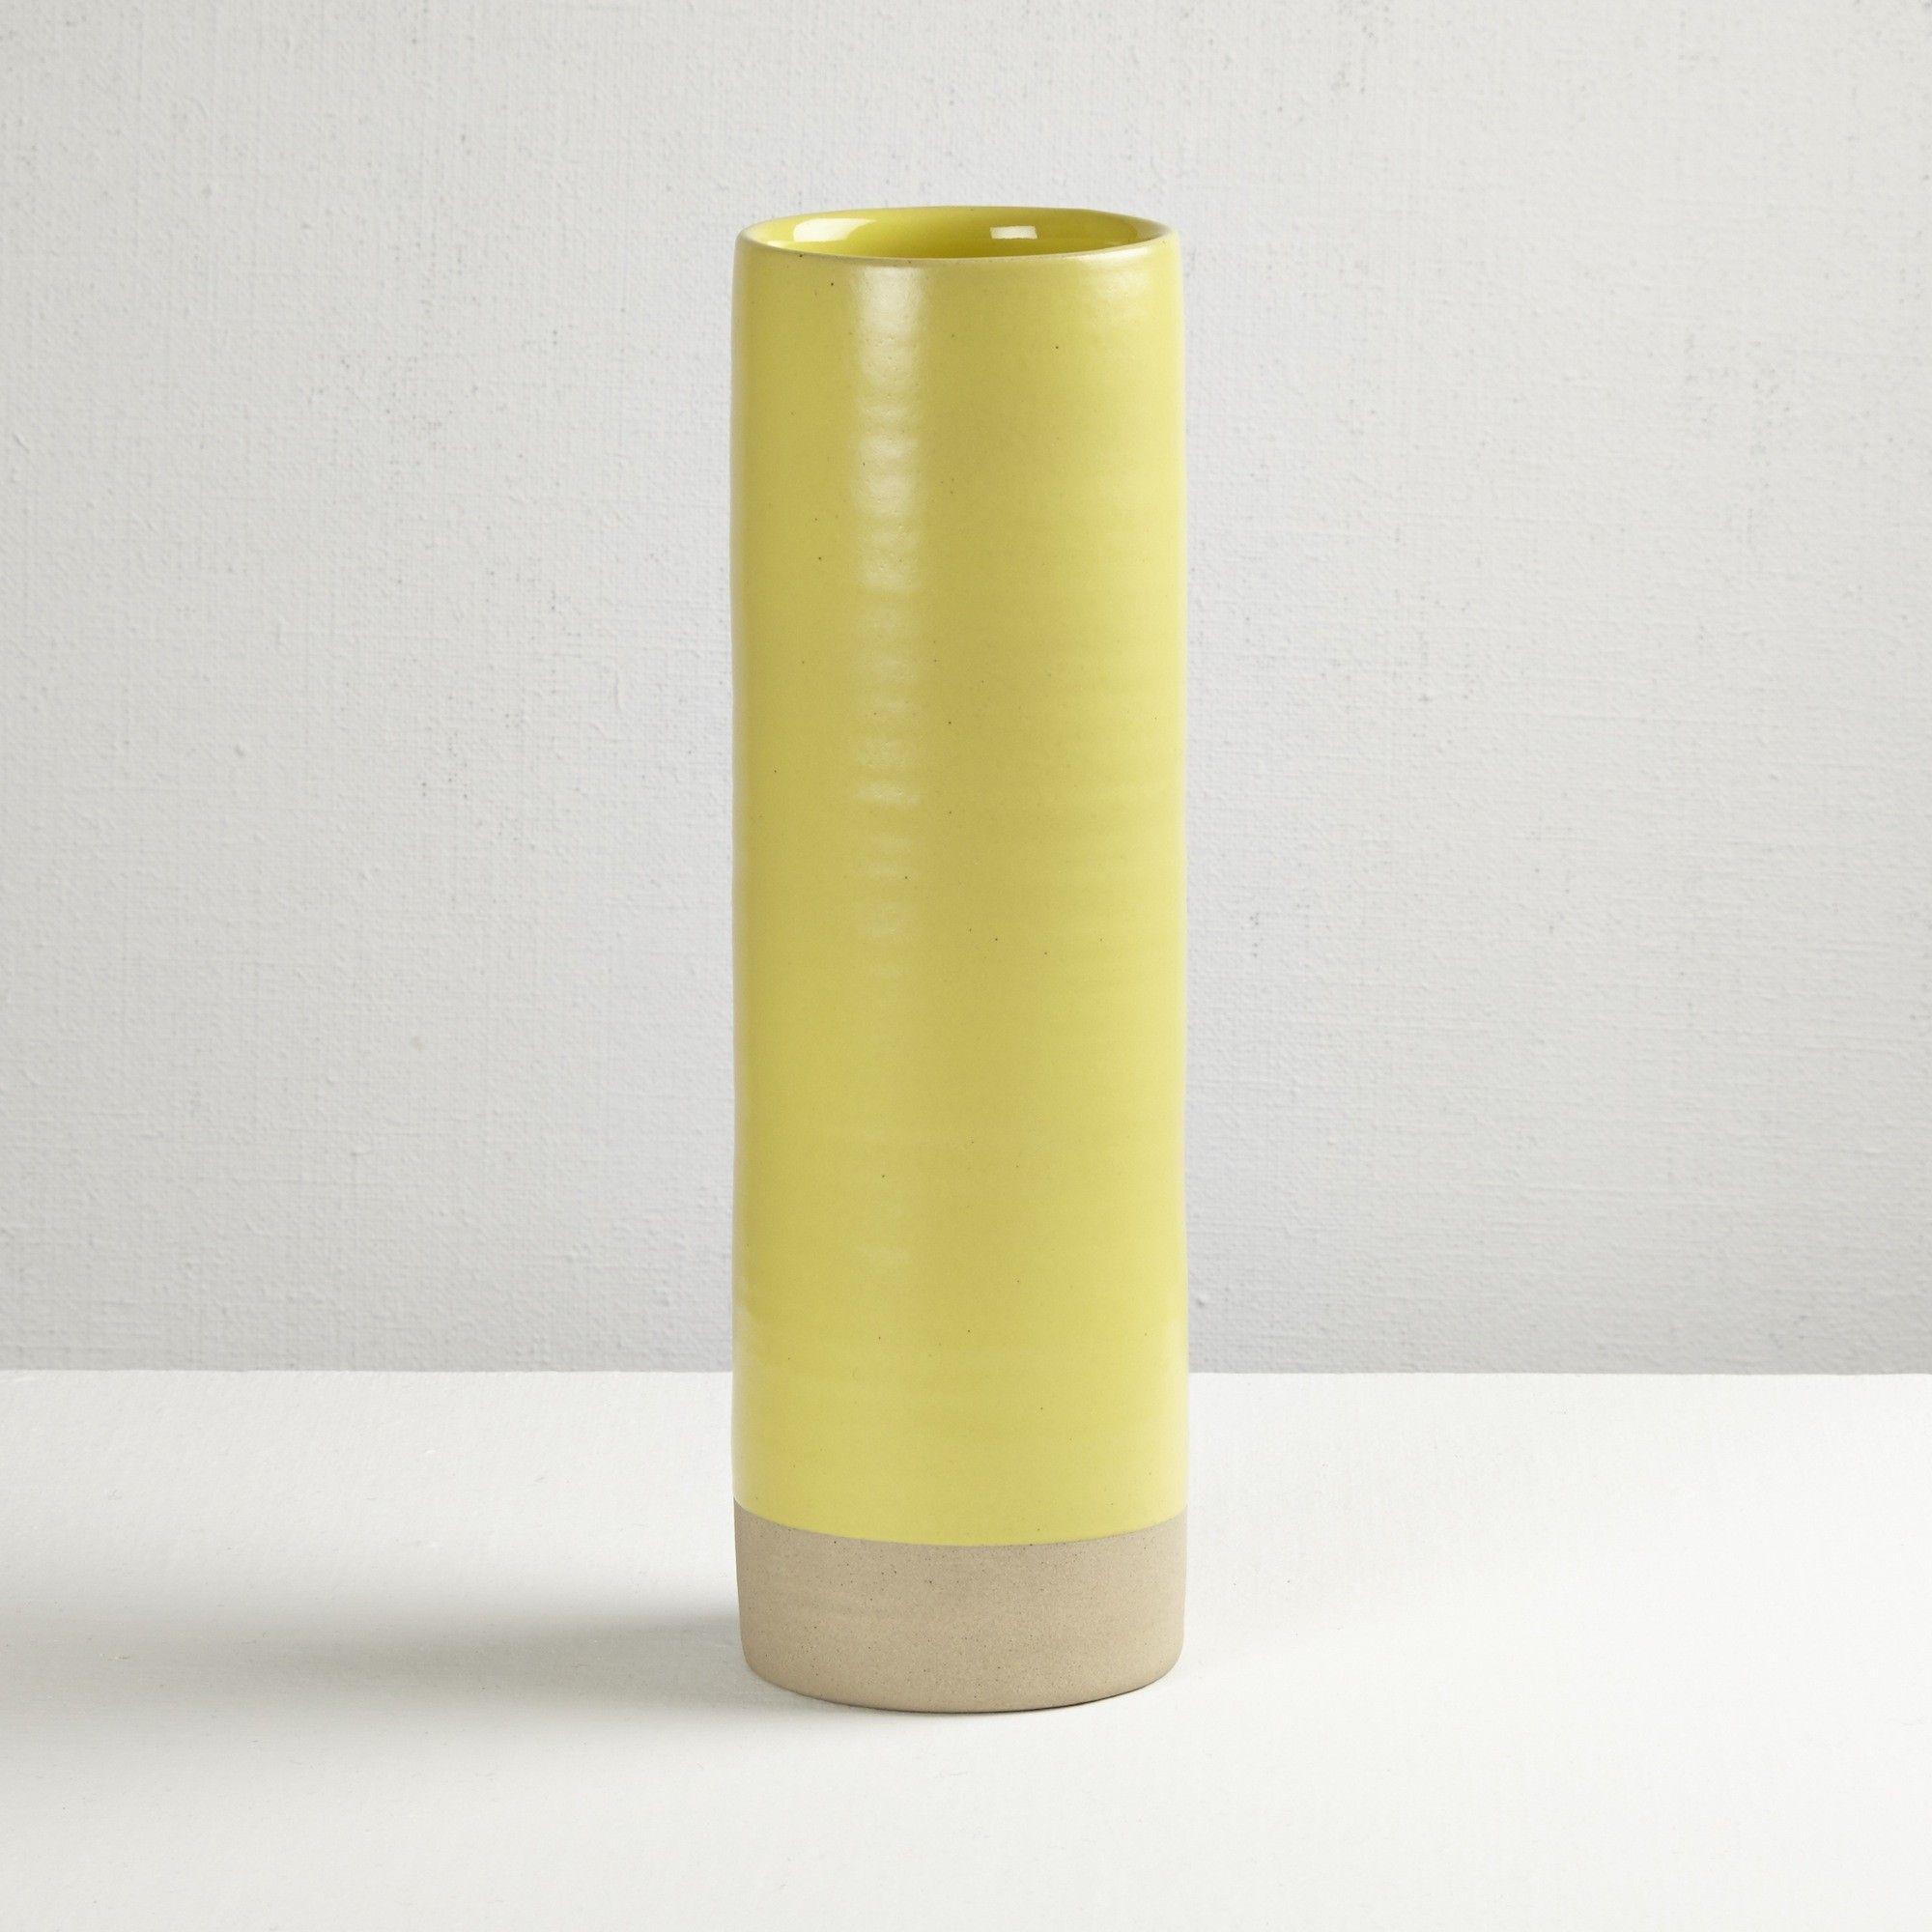 Darkroom Les Guimards Large Cylinder Vase Mimosa